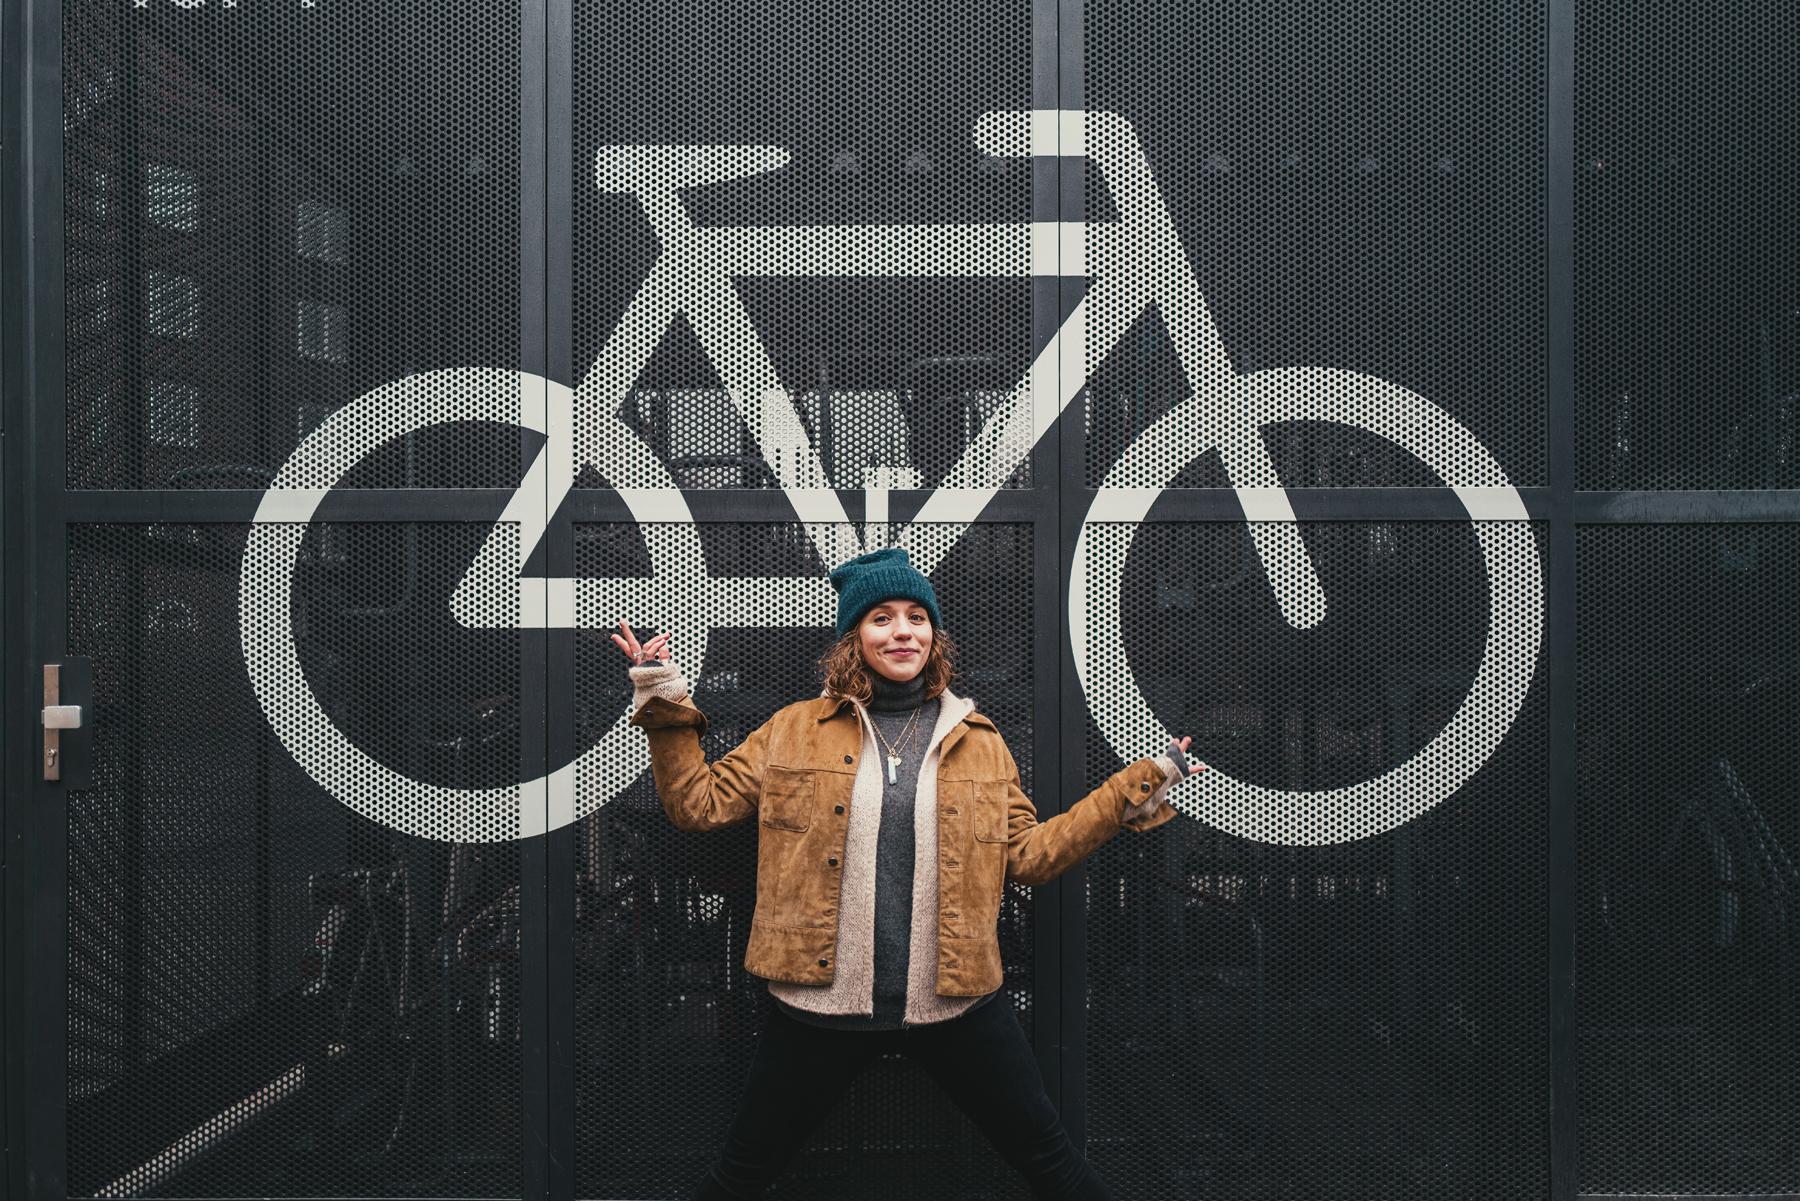 Geheimtipp Hamburg Radporterin 6 Bike and Ride Jan Traupe5